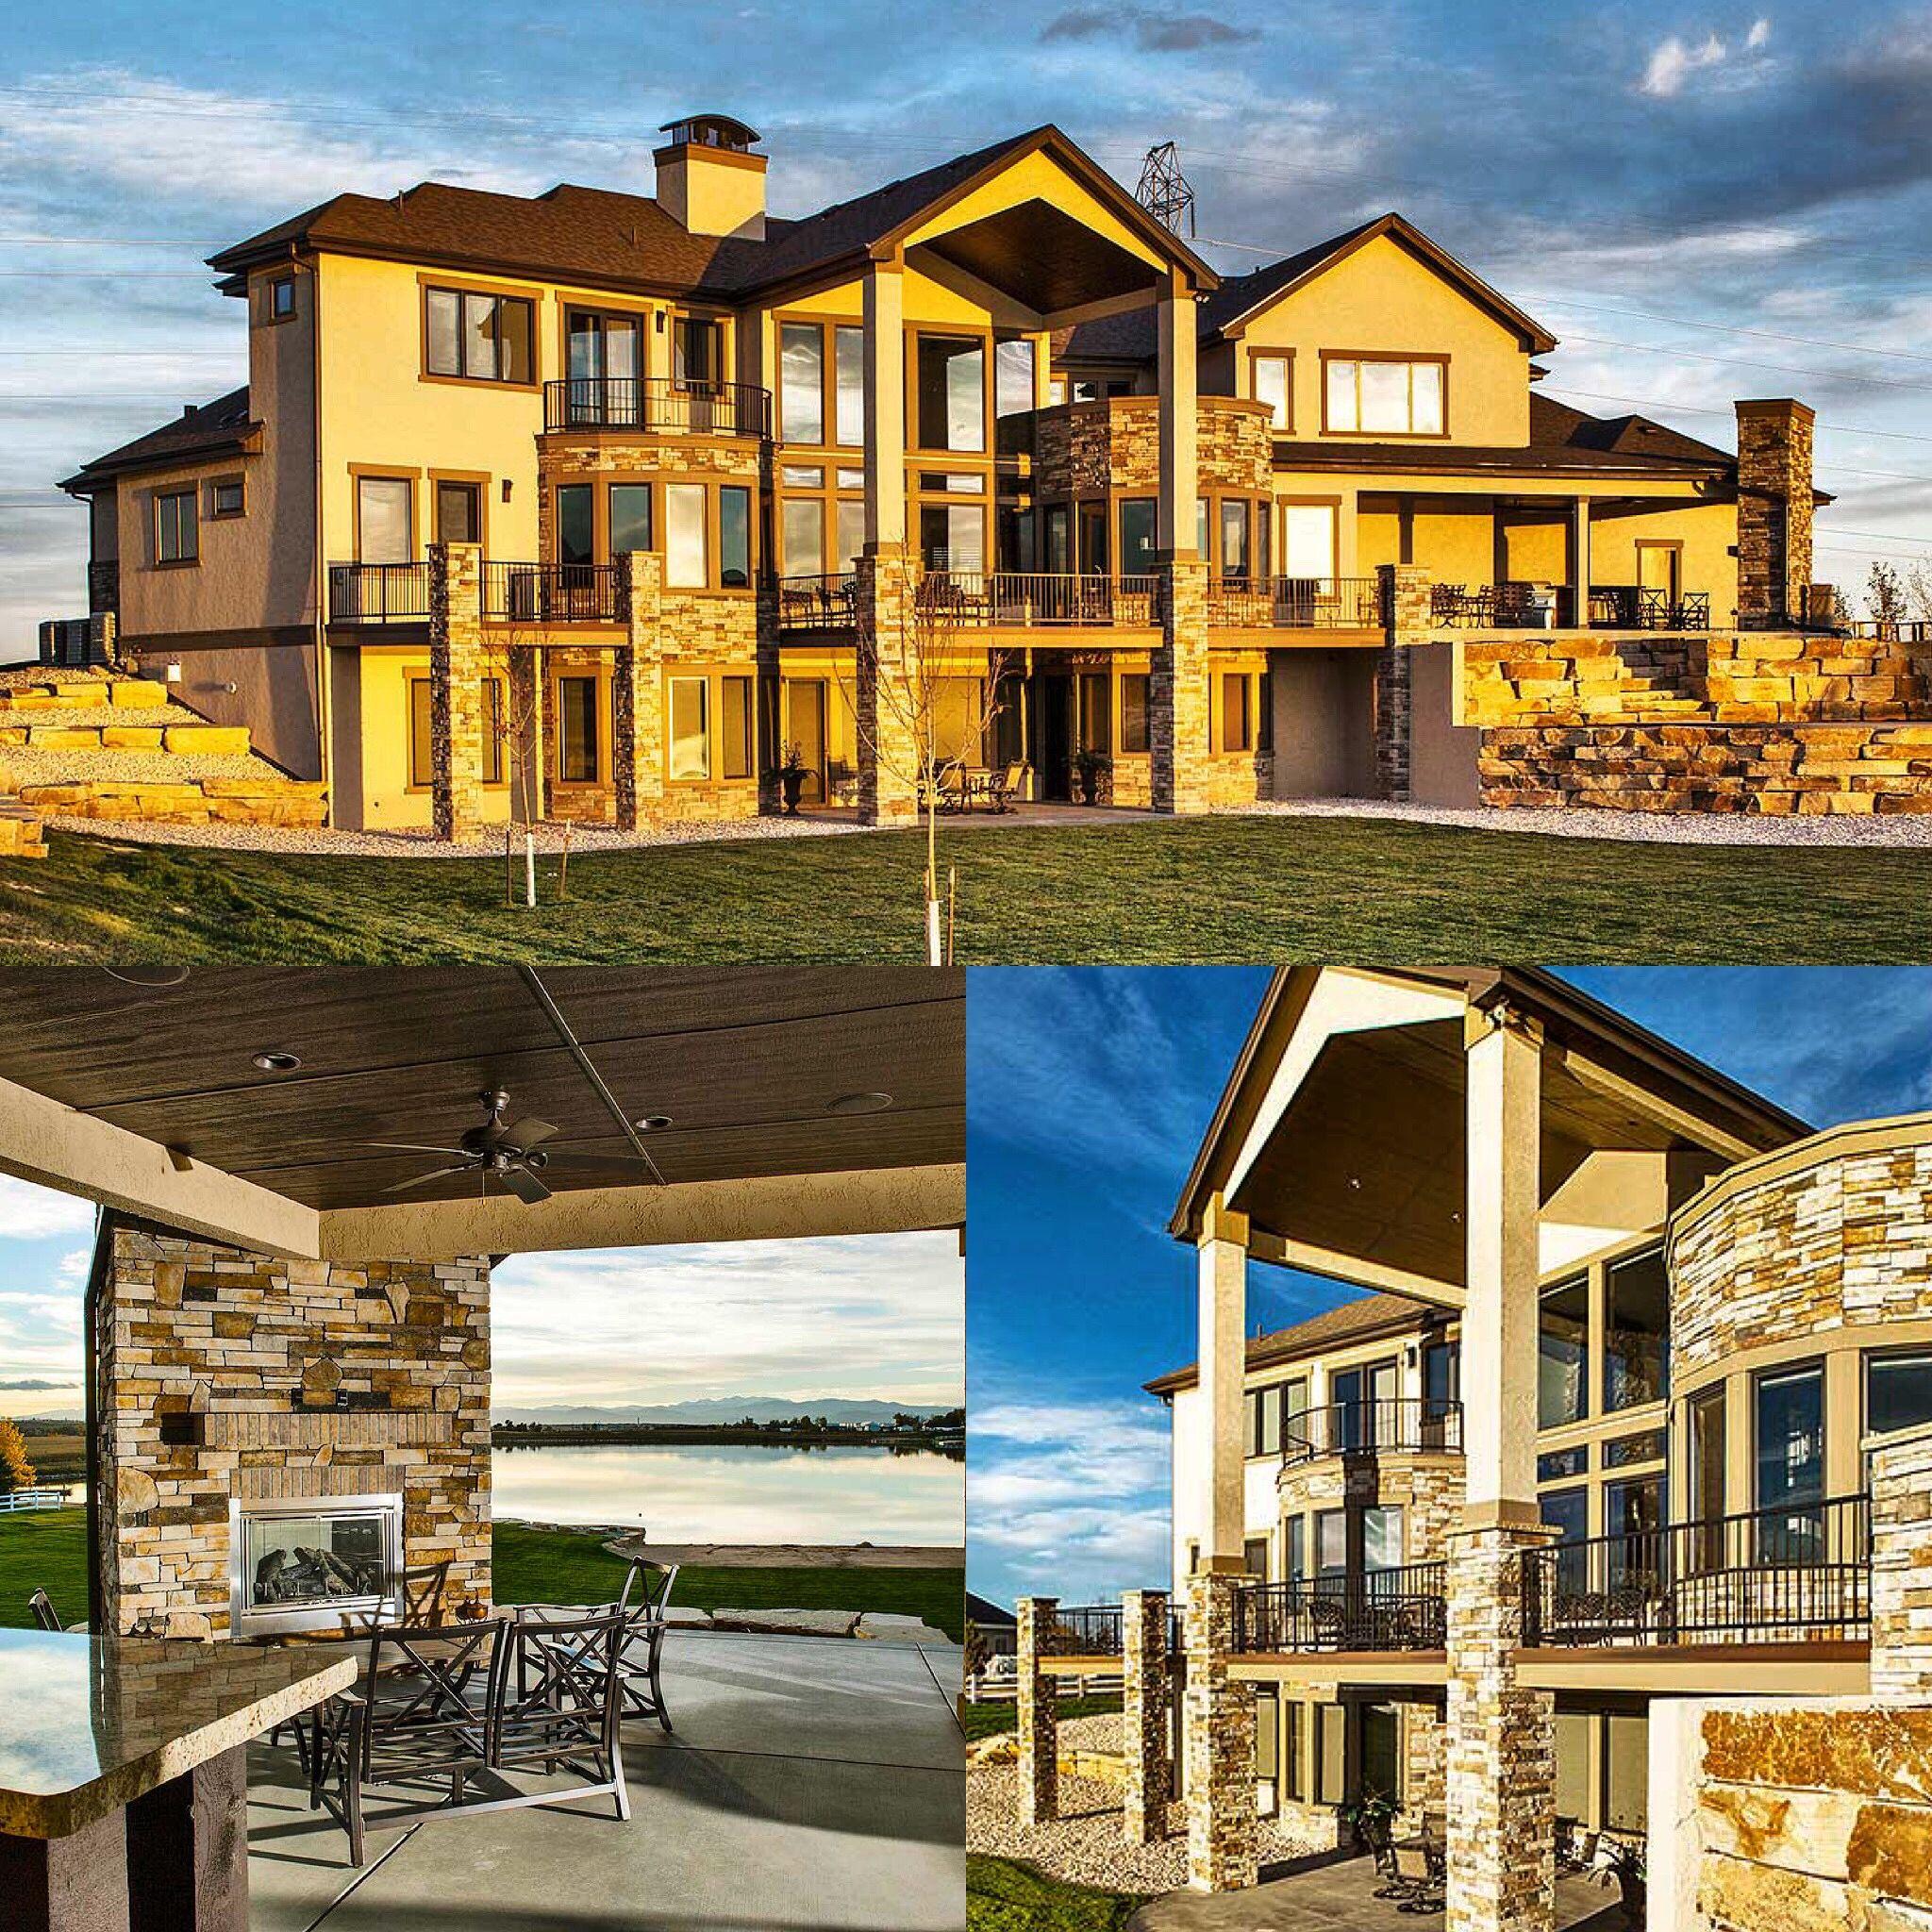 Luxury Lake Homes On Mountain: Plan 95022RW: Eye-Catching Mountain Home With Optional